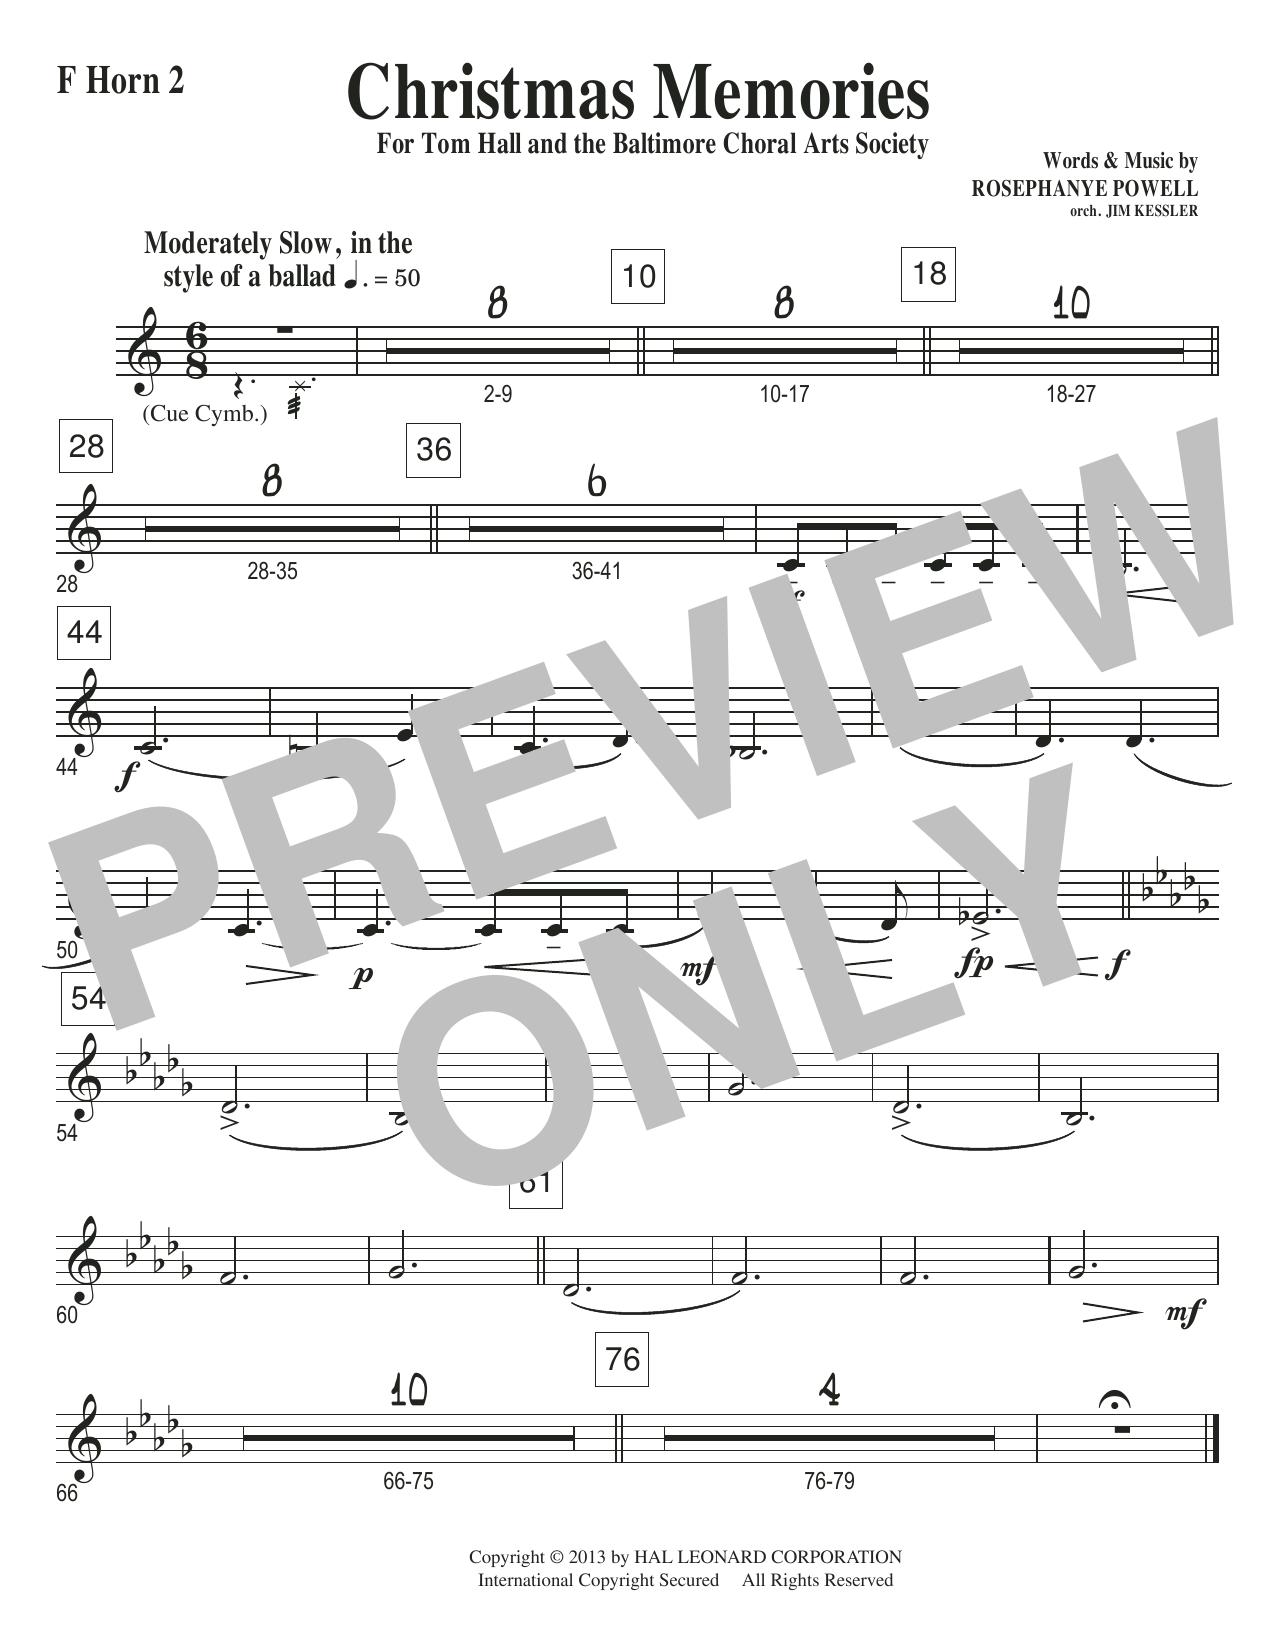 Christmas Memories - F Horn 2 Sheet Music